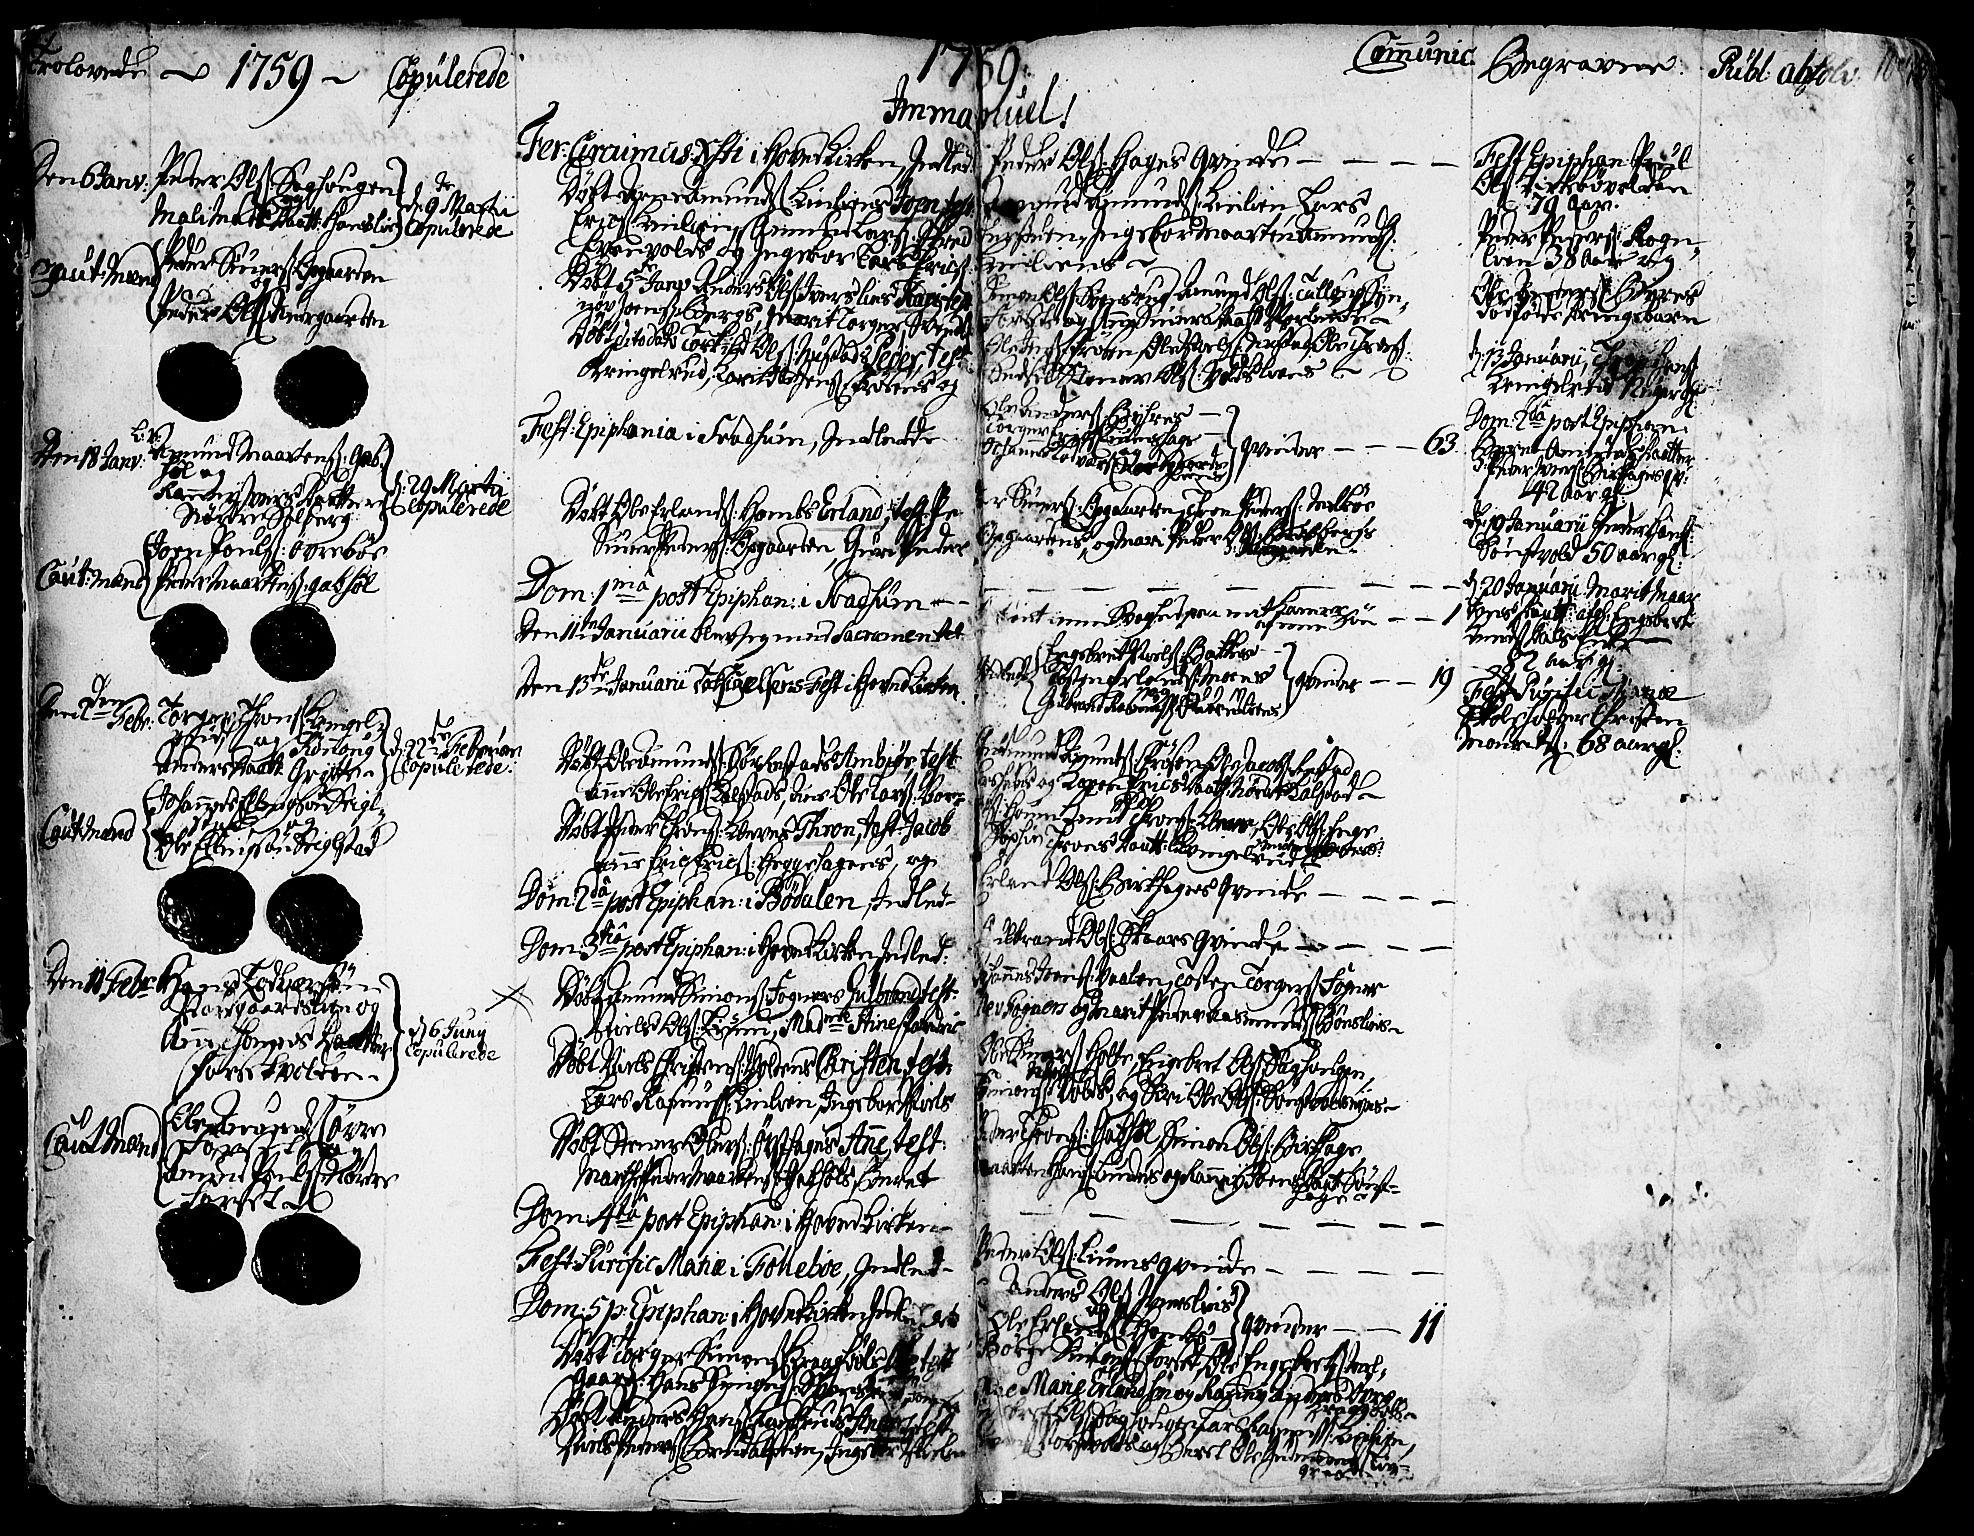 SAH, Gausdal prestekontor, Ministerialbok nr. 3, 1758-1809, s. 10